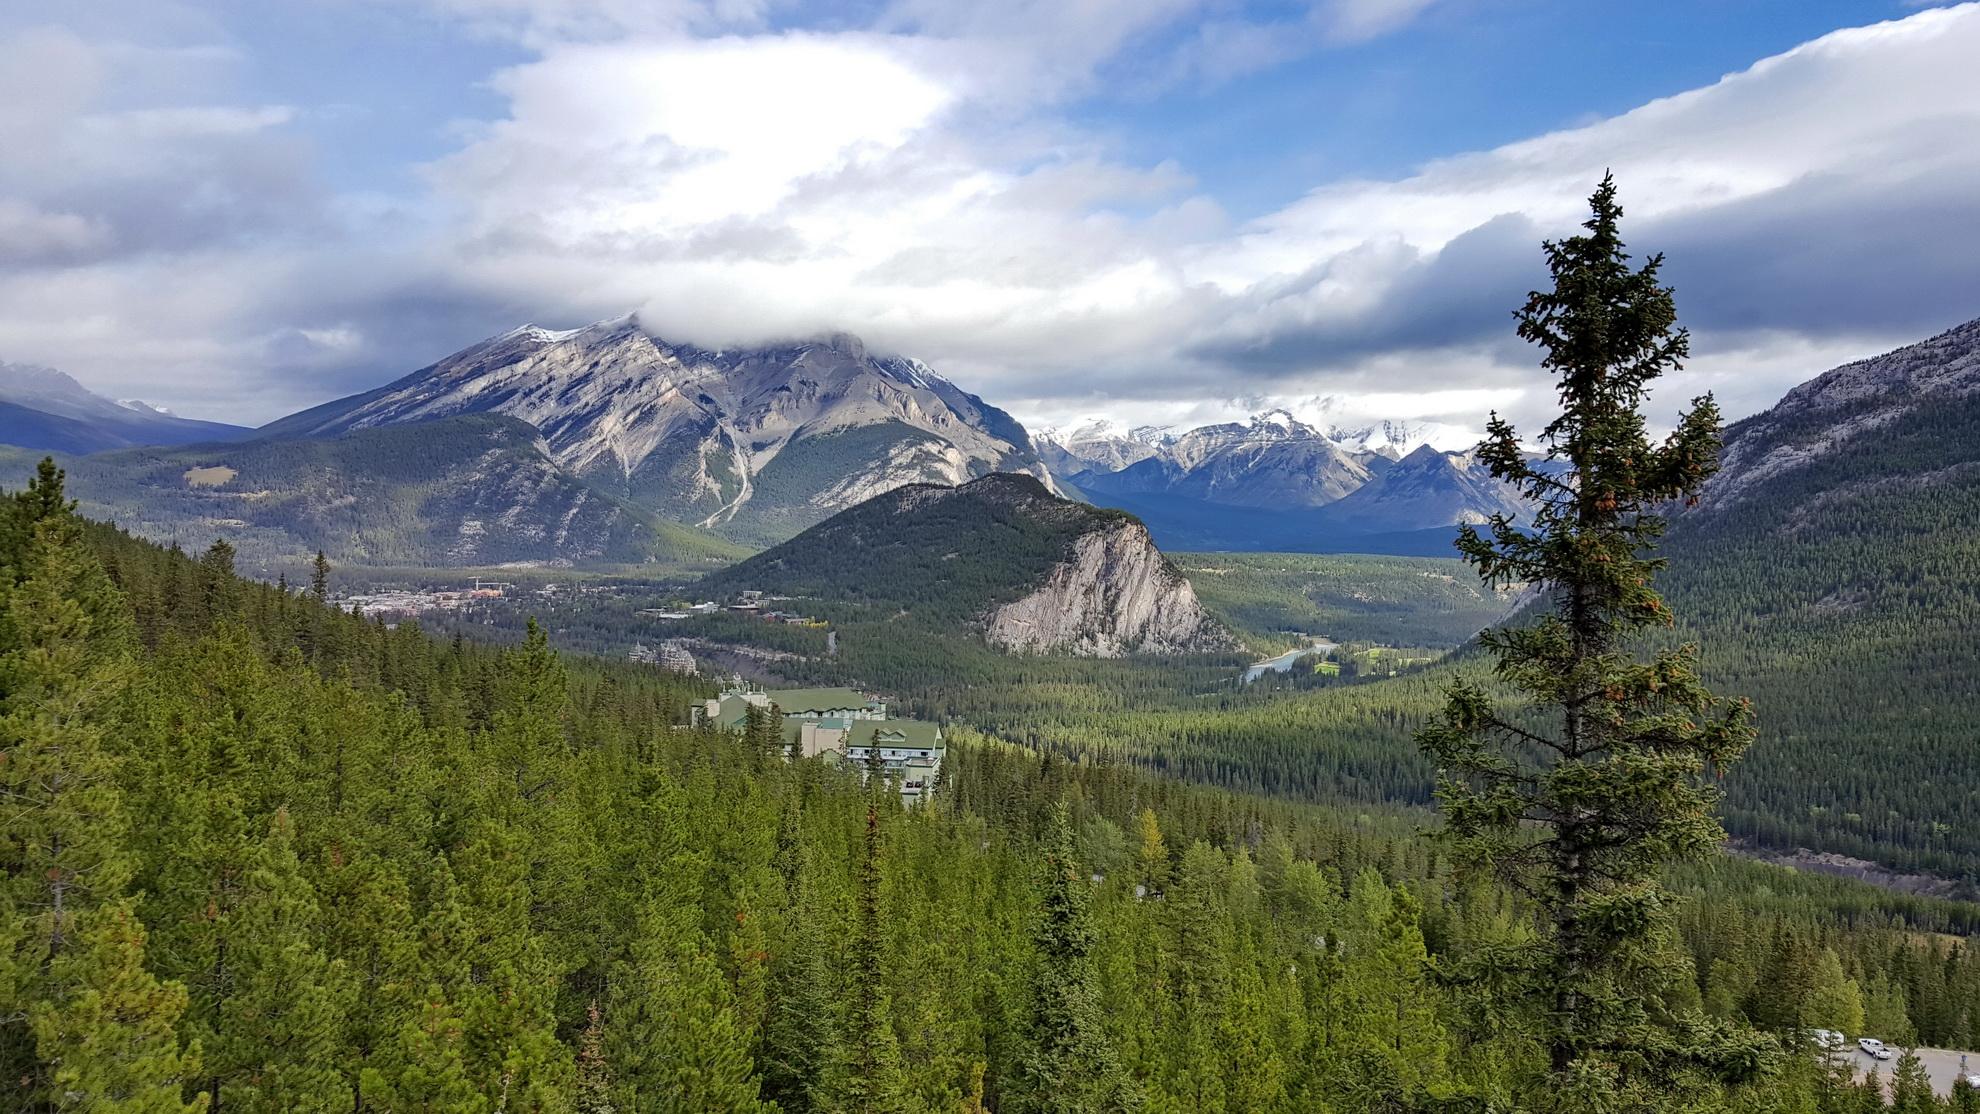 [Snow Season Choice] Banff Sulphur Mountain Gondola Ticket